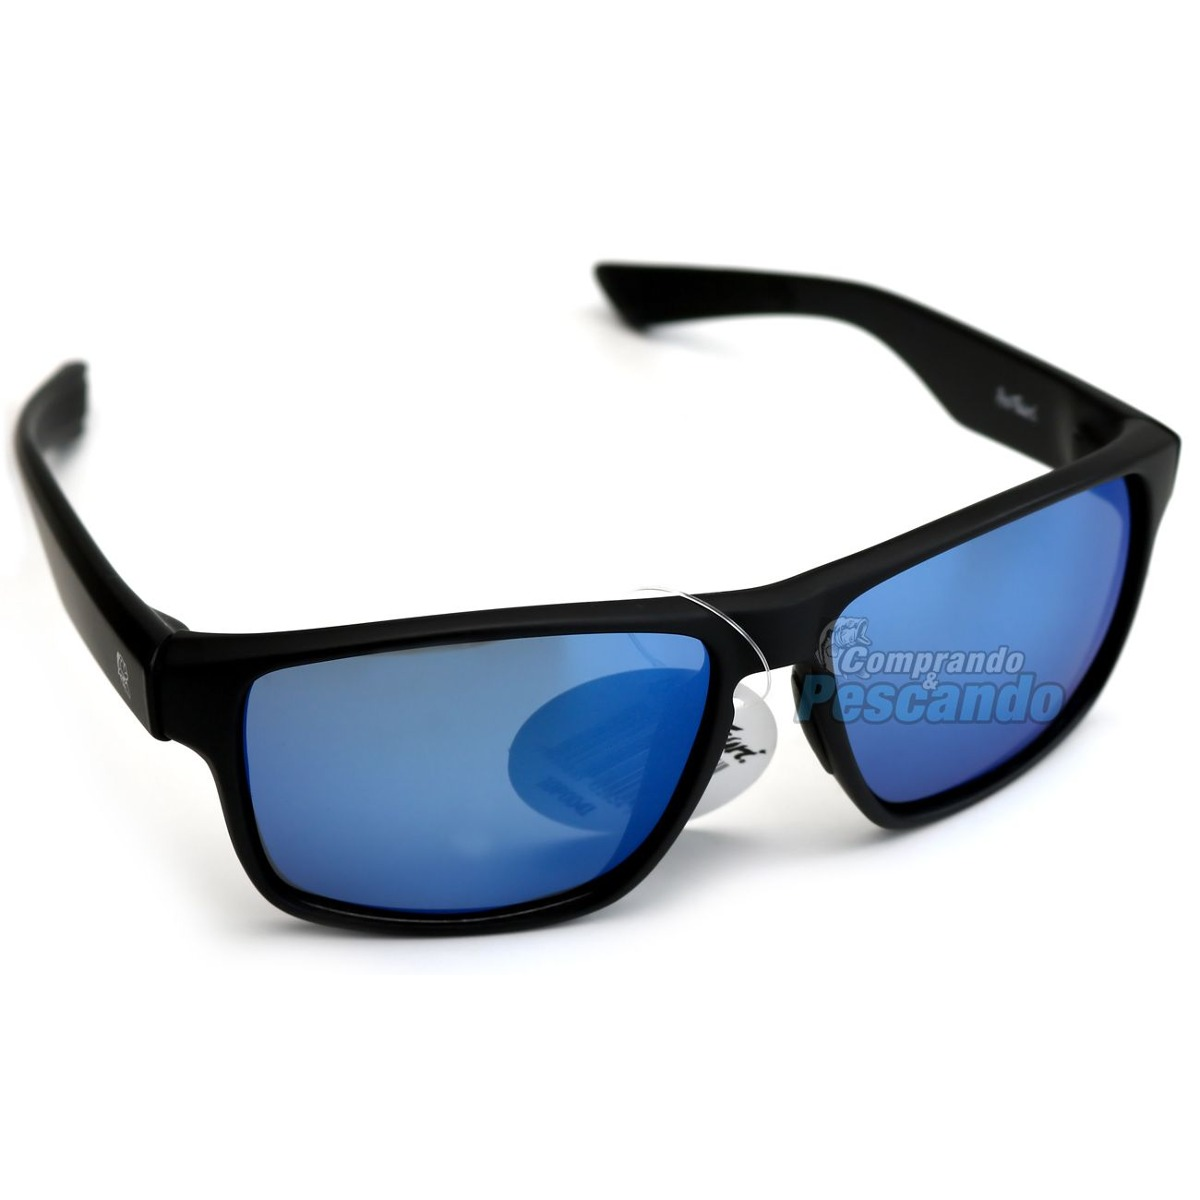 8961ca8663c1b Óculos Polarizado Tarpon Pro-tsuri Lente Azul 10p0041 - R  132,89 em ...